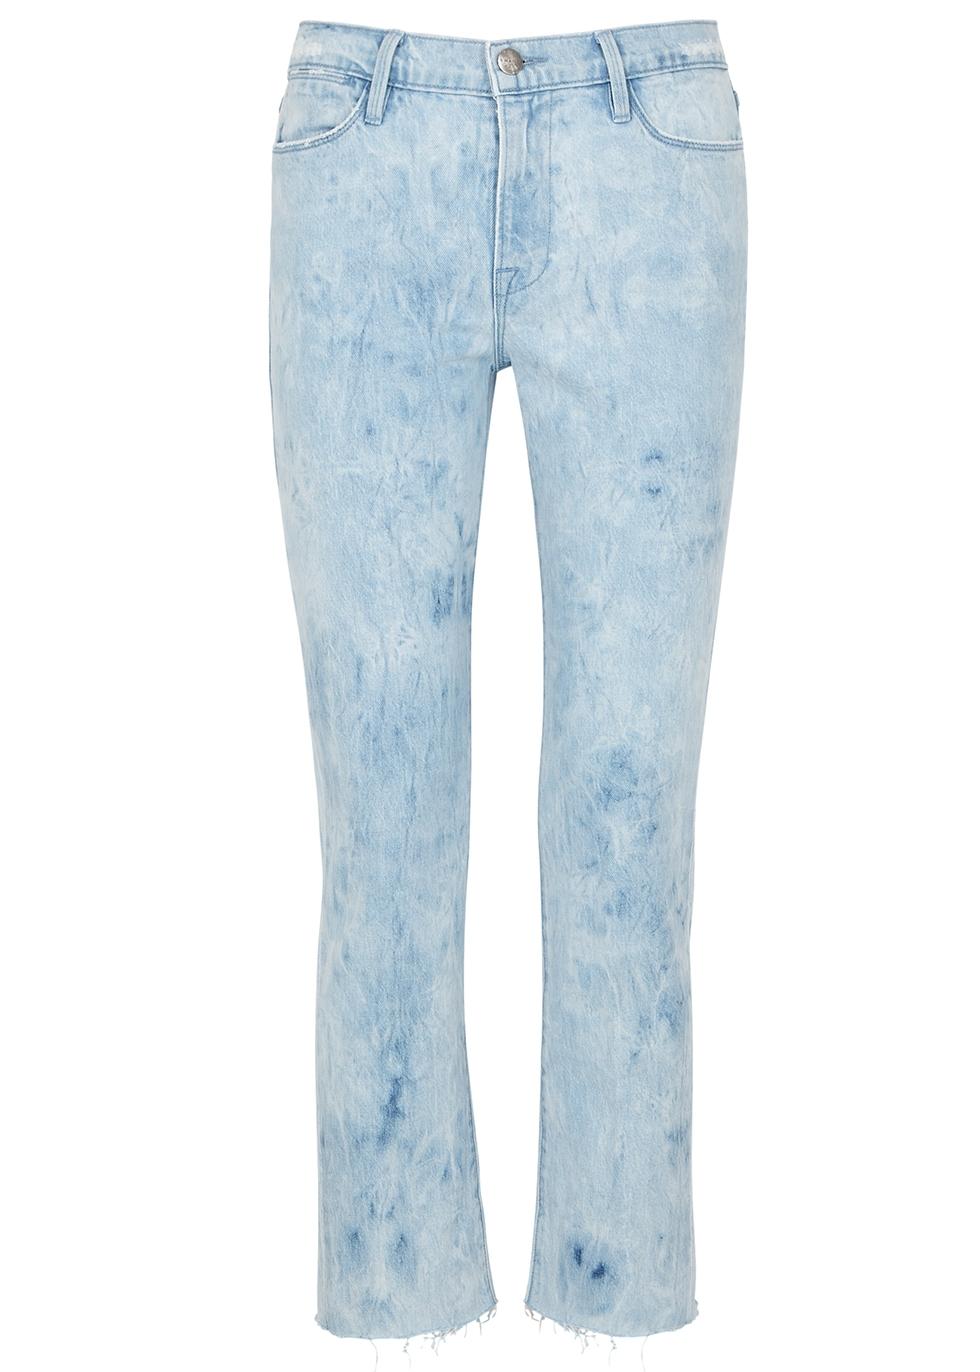 Le High Straight pale blue jeans - Frame Denim